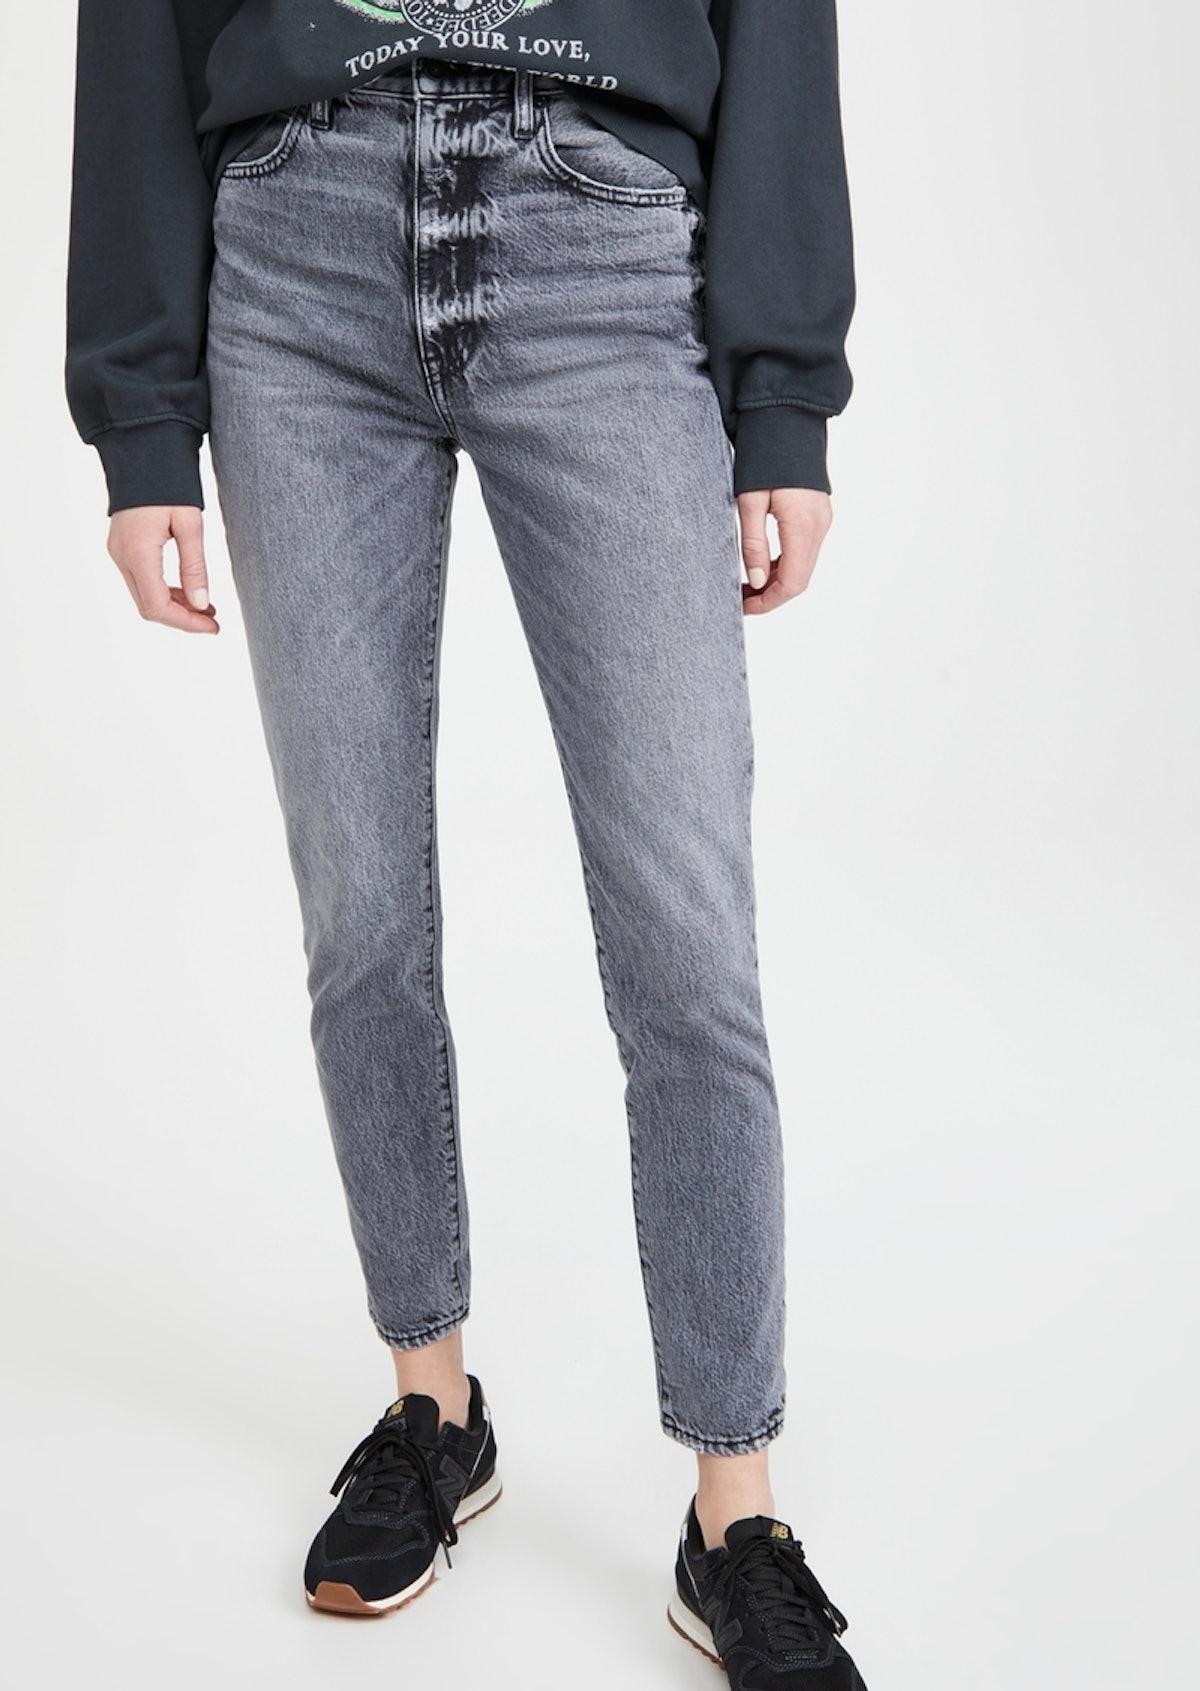 Women's Beatnik Moonlight Jeans